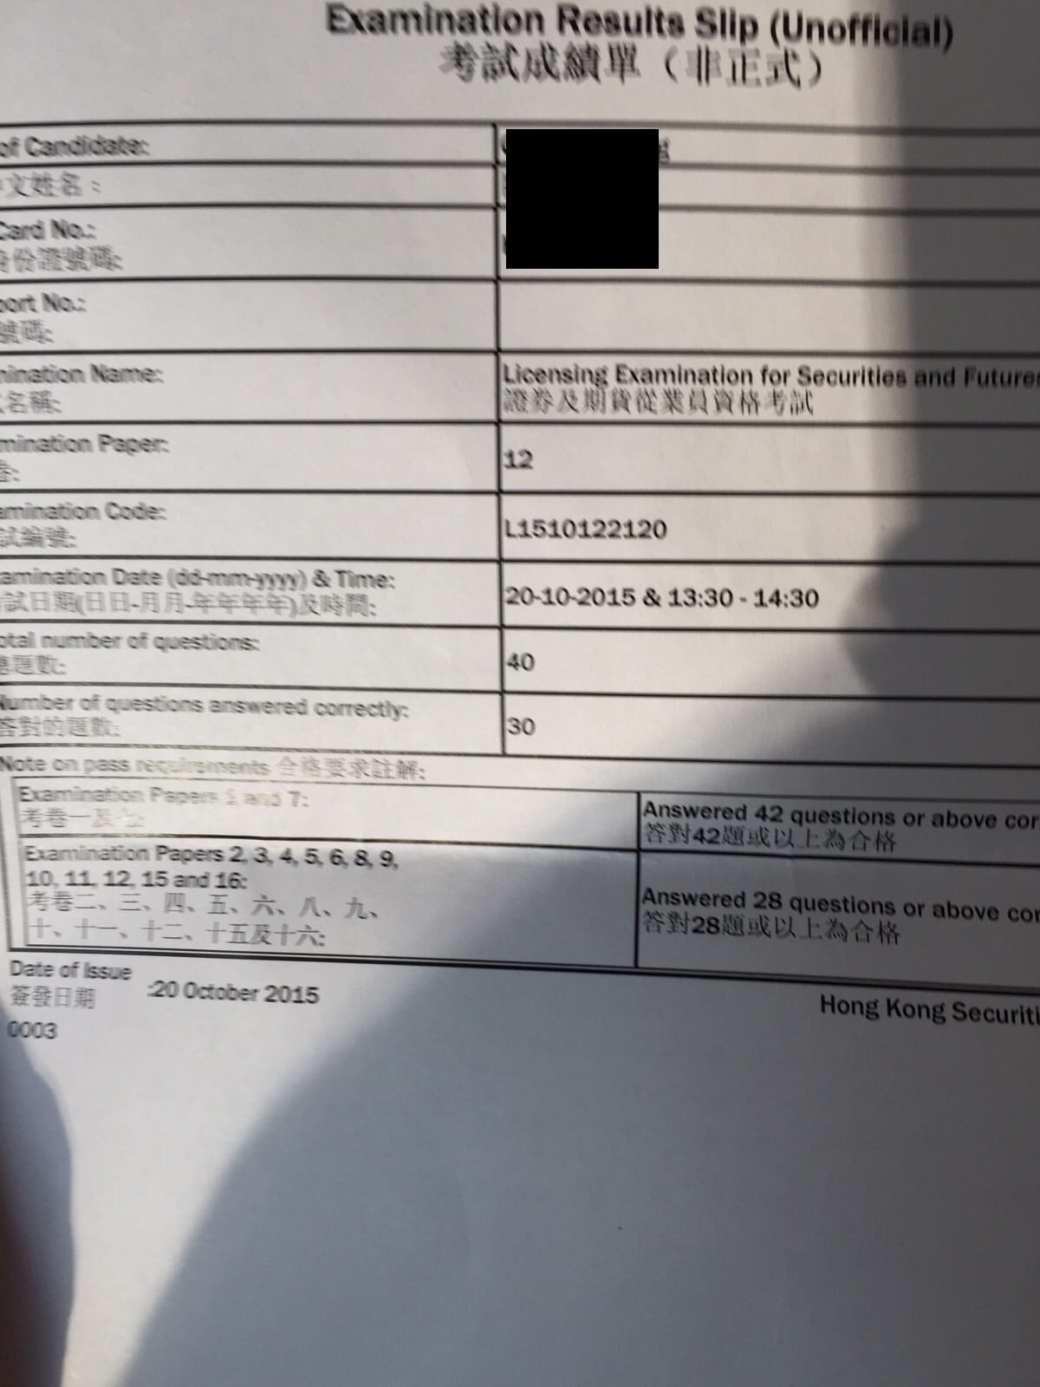 Stephenchan 20/10/2015 LE Paper 12 證券期貨從業員資格考試卷十二 Pass